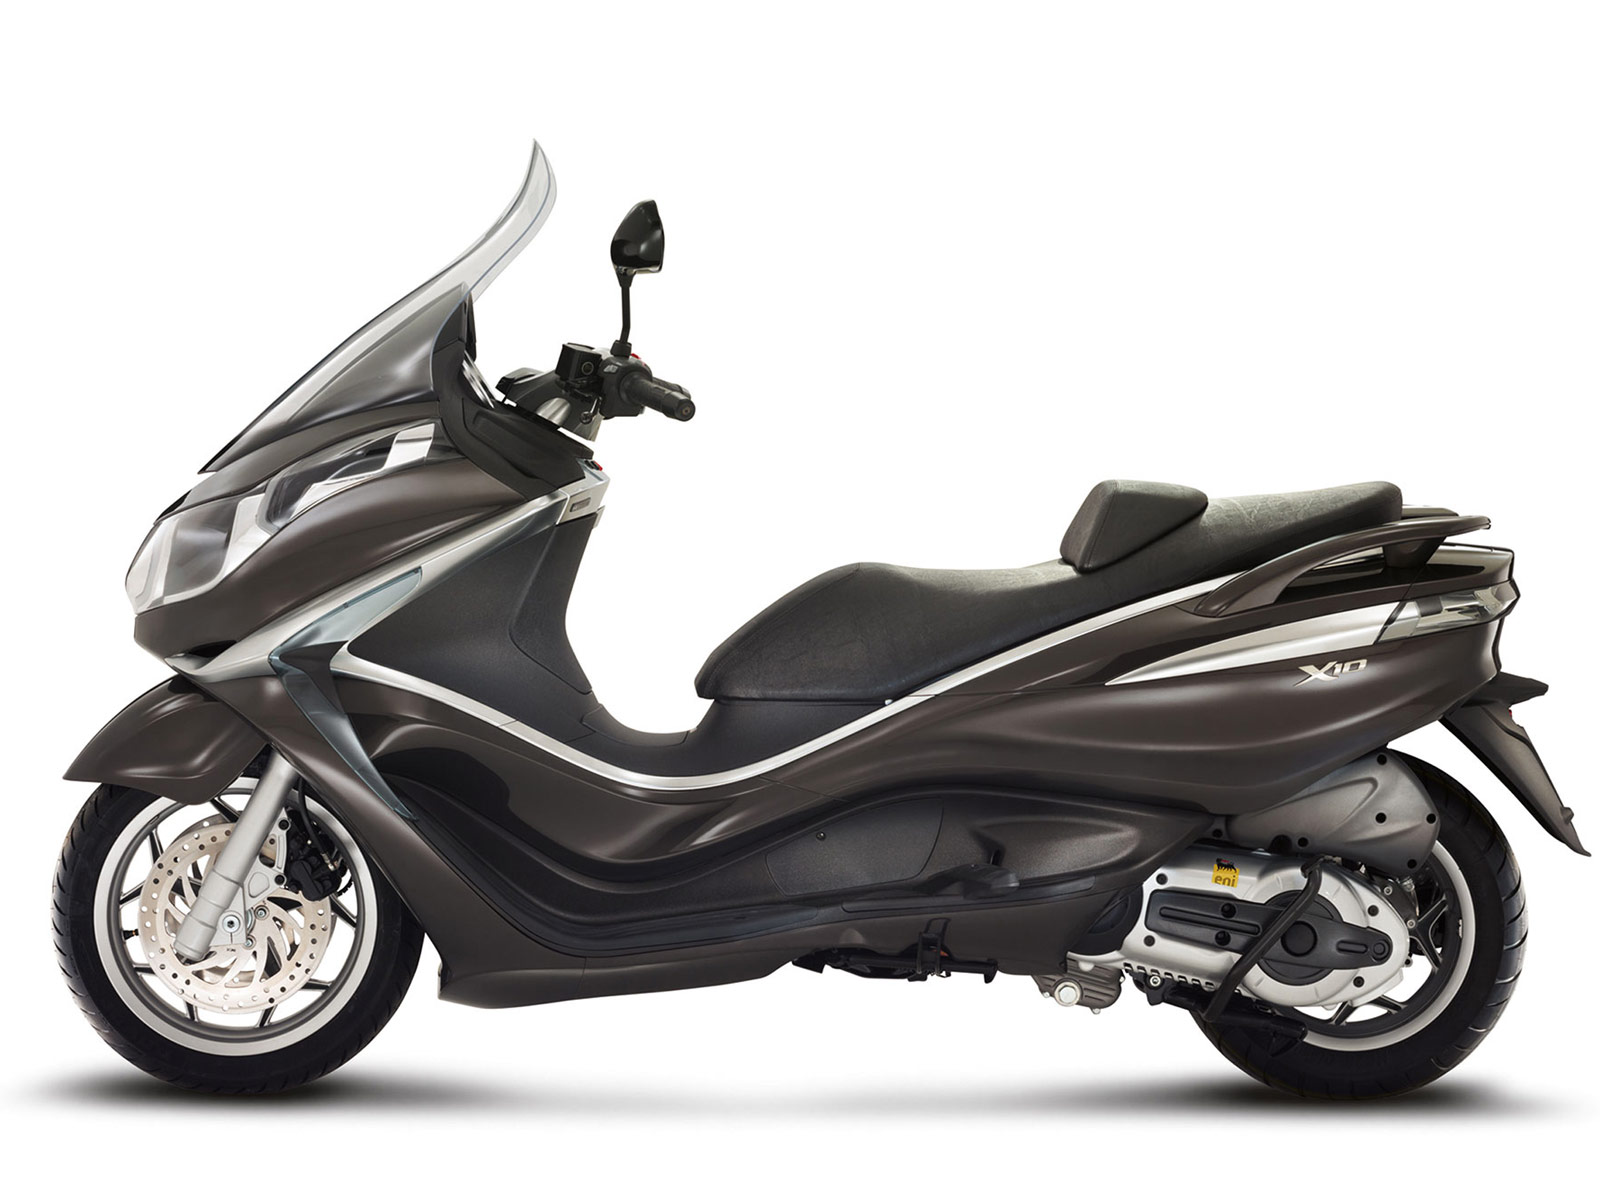 insurance information 2013 piaggio x10 500 scooter. Black Bedroom Furniture Sets. Home Design Ideas